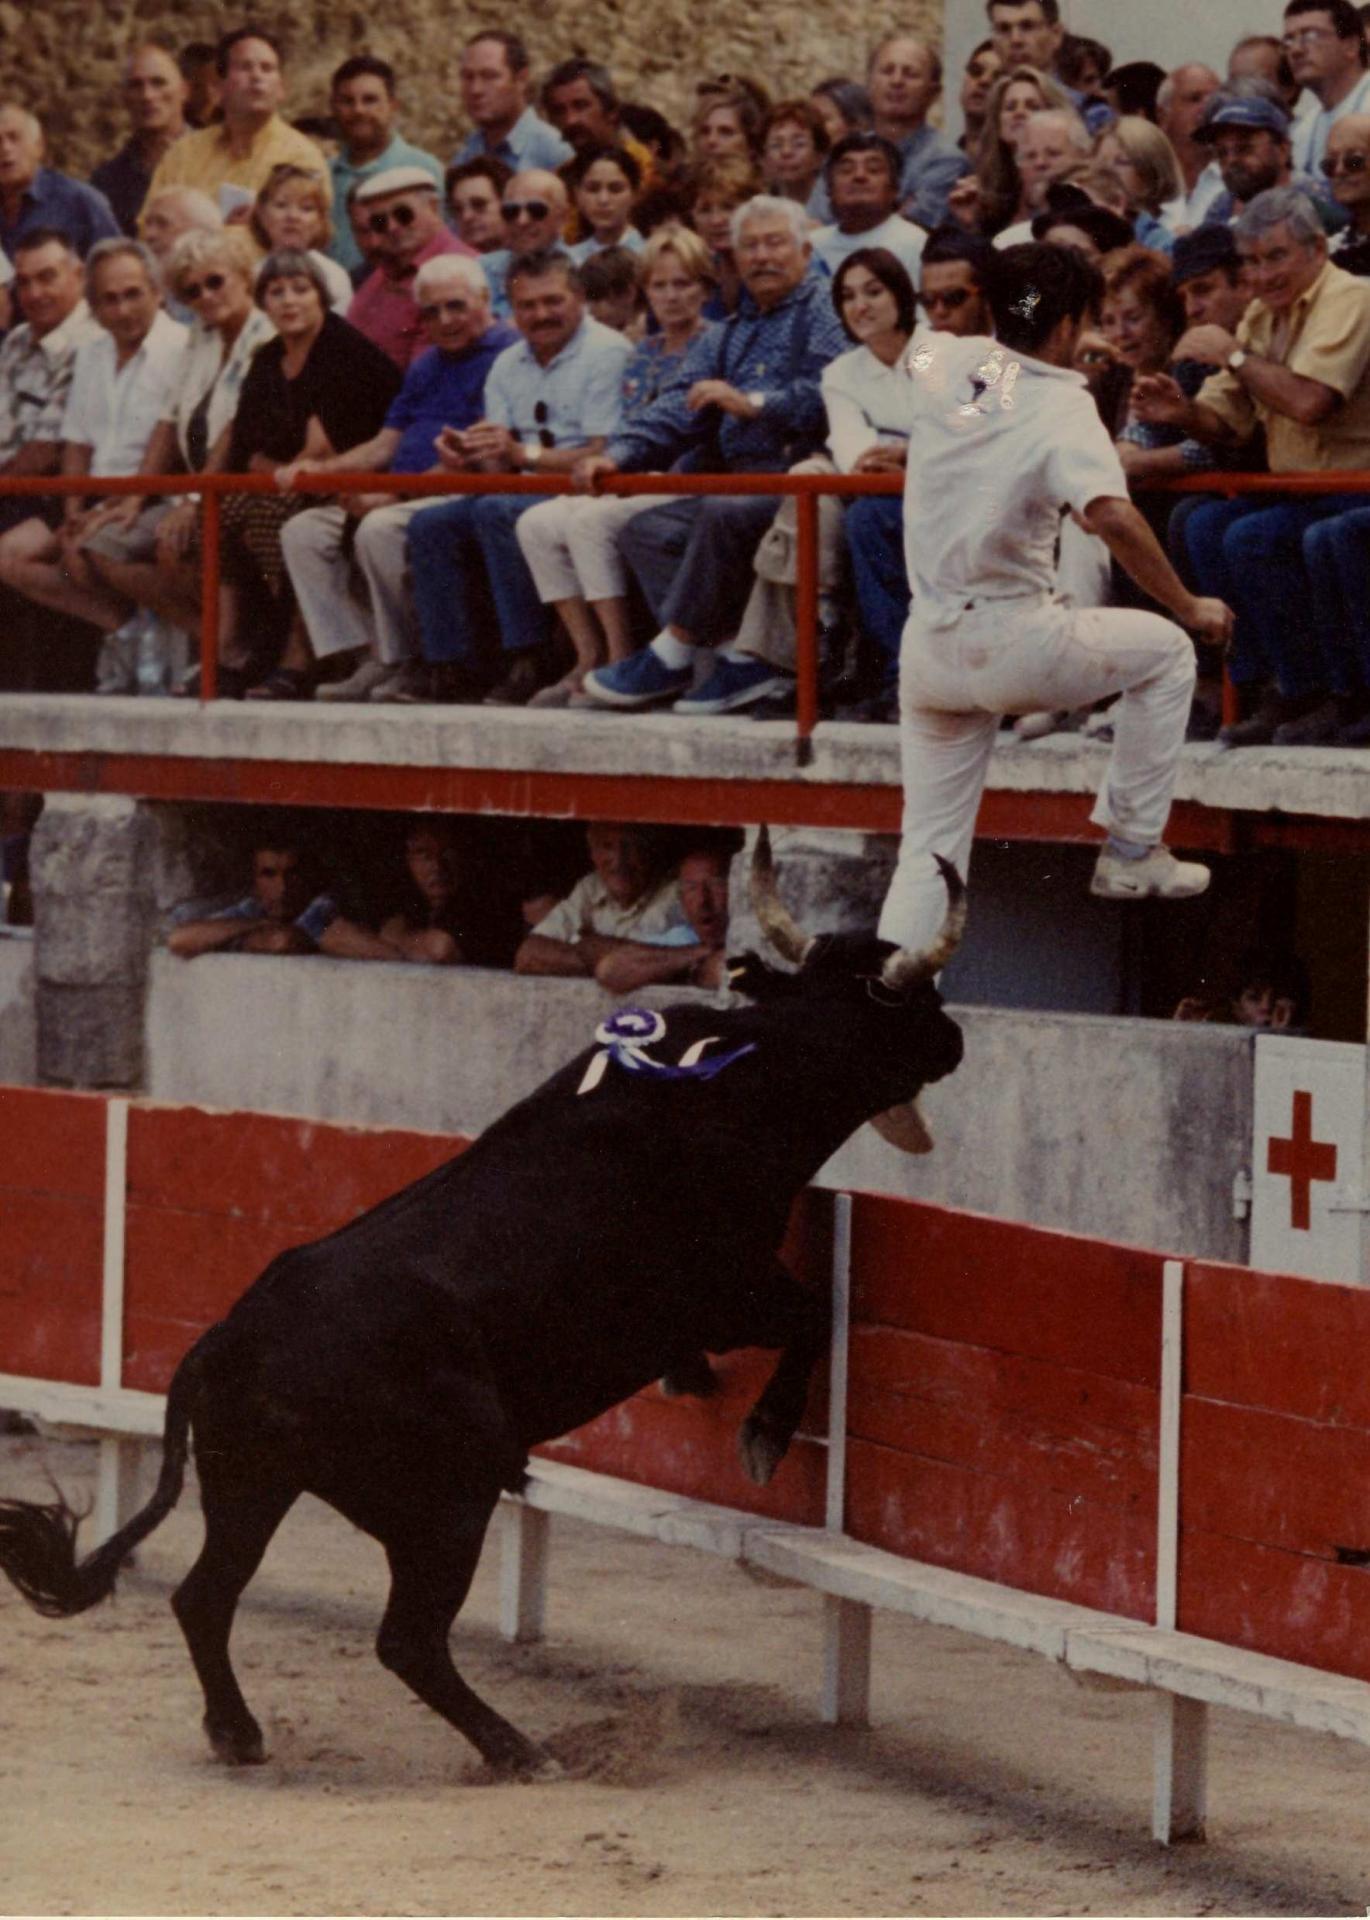 Fabio du joncas 01 09 2002 ph naval